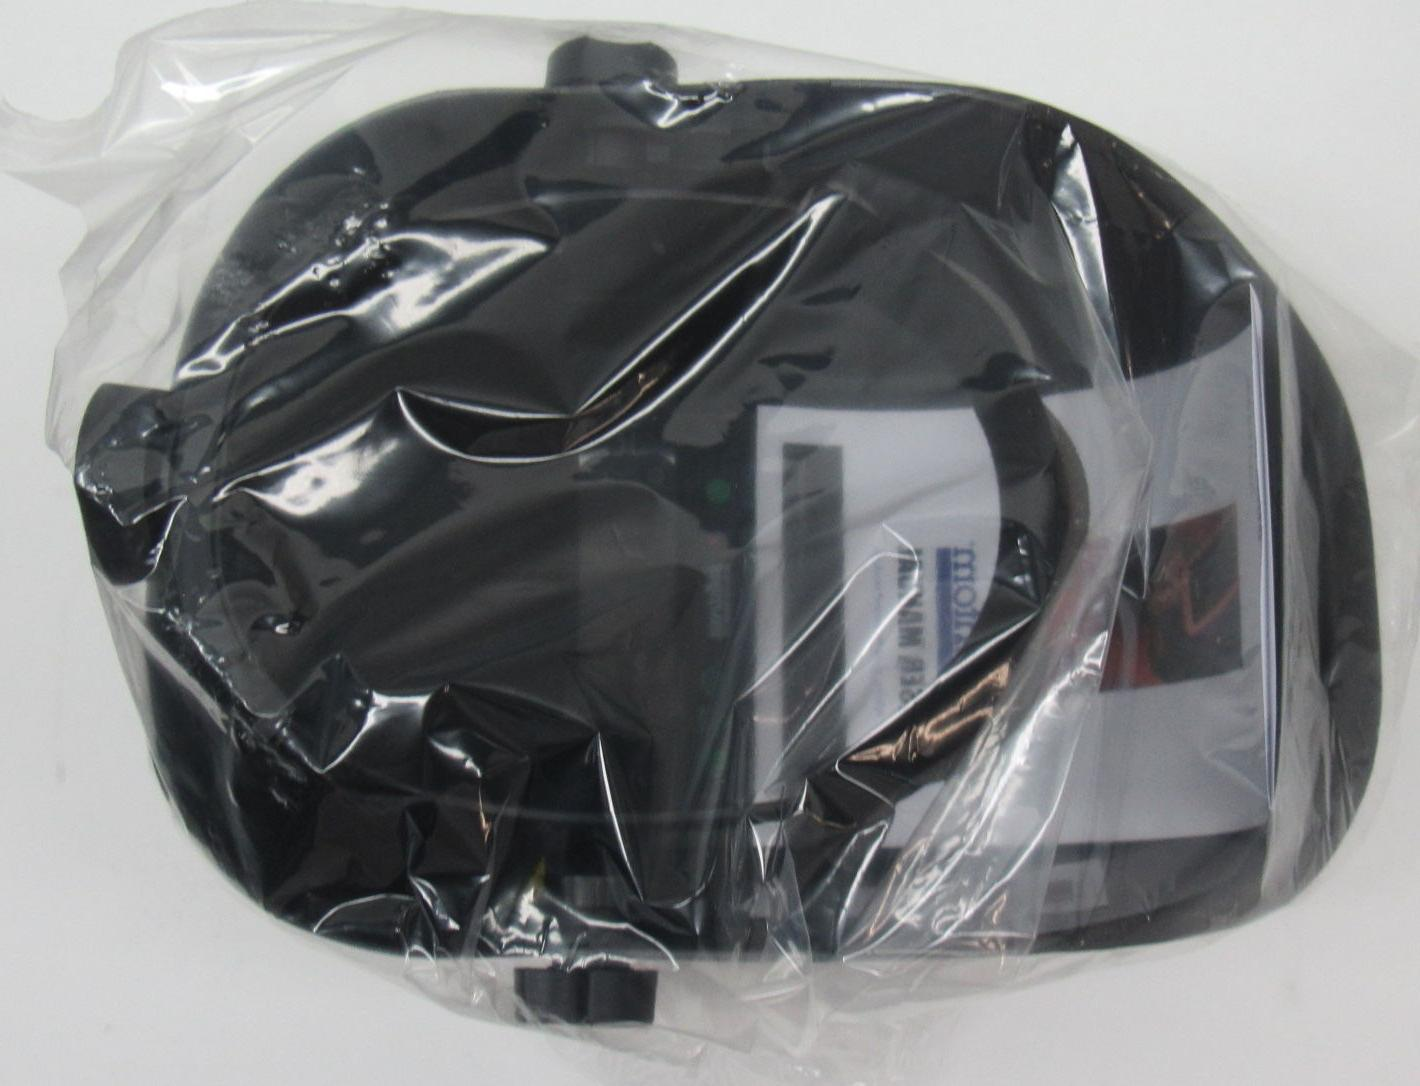 NEW 290 Series Auto-Darkening Helmet Super Kool Silver ++